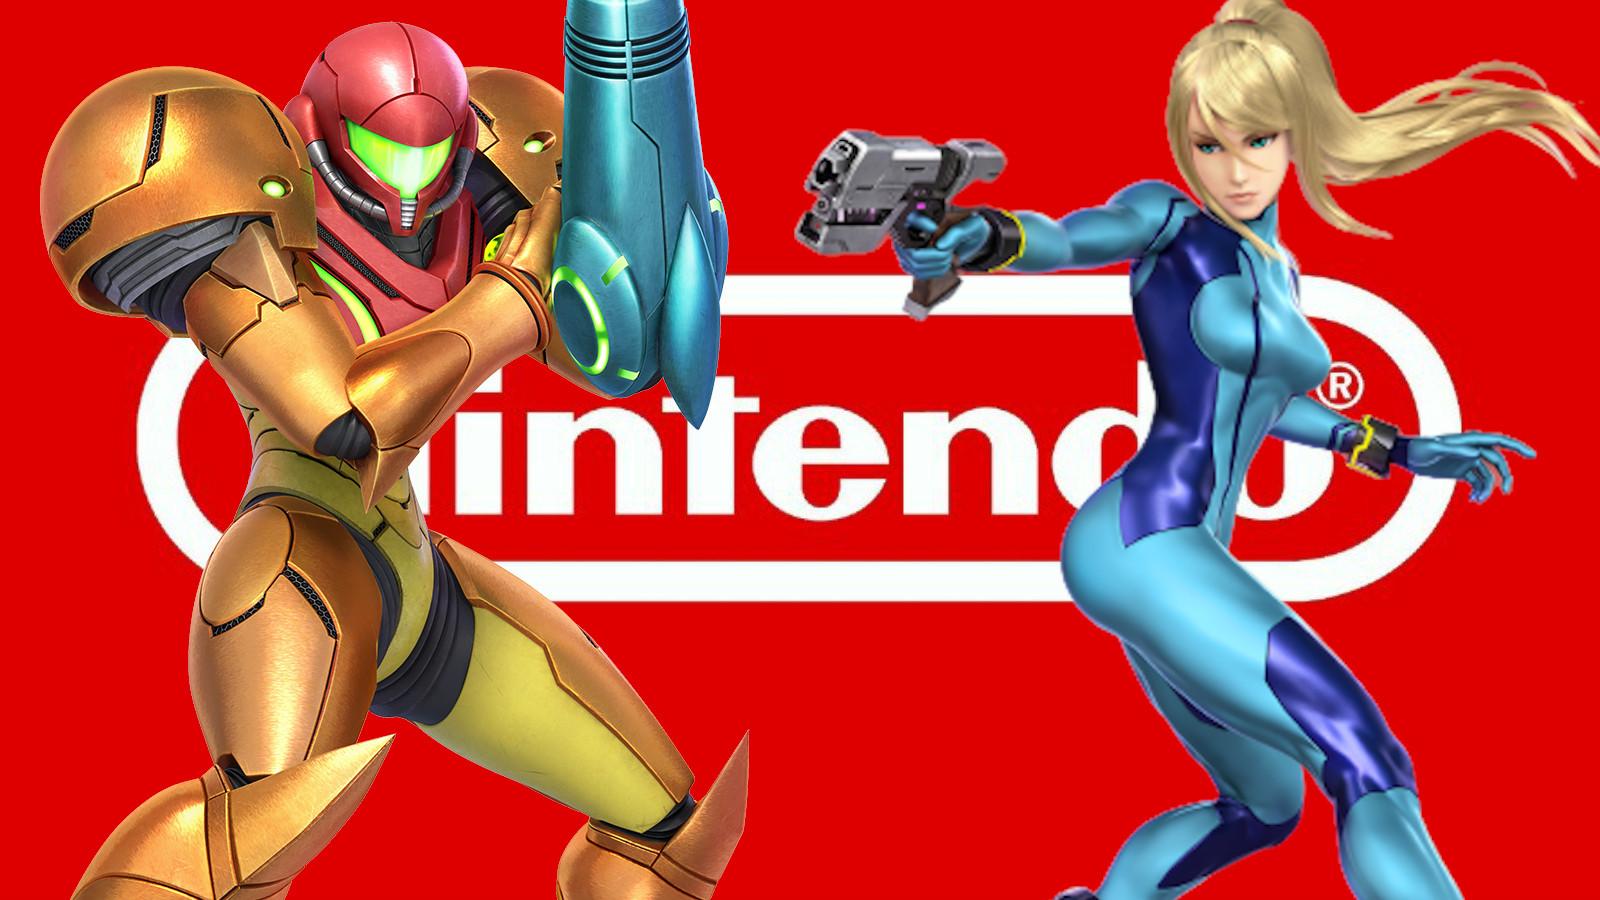 Metroid Nintendo Direct